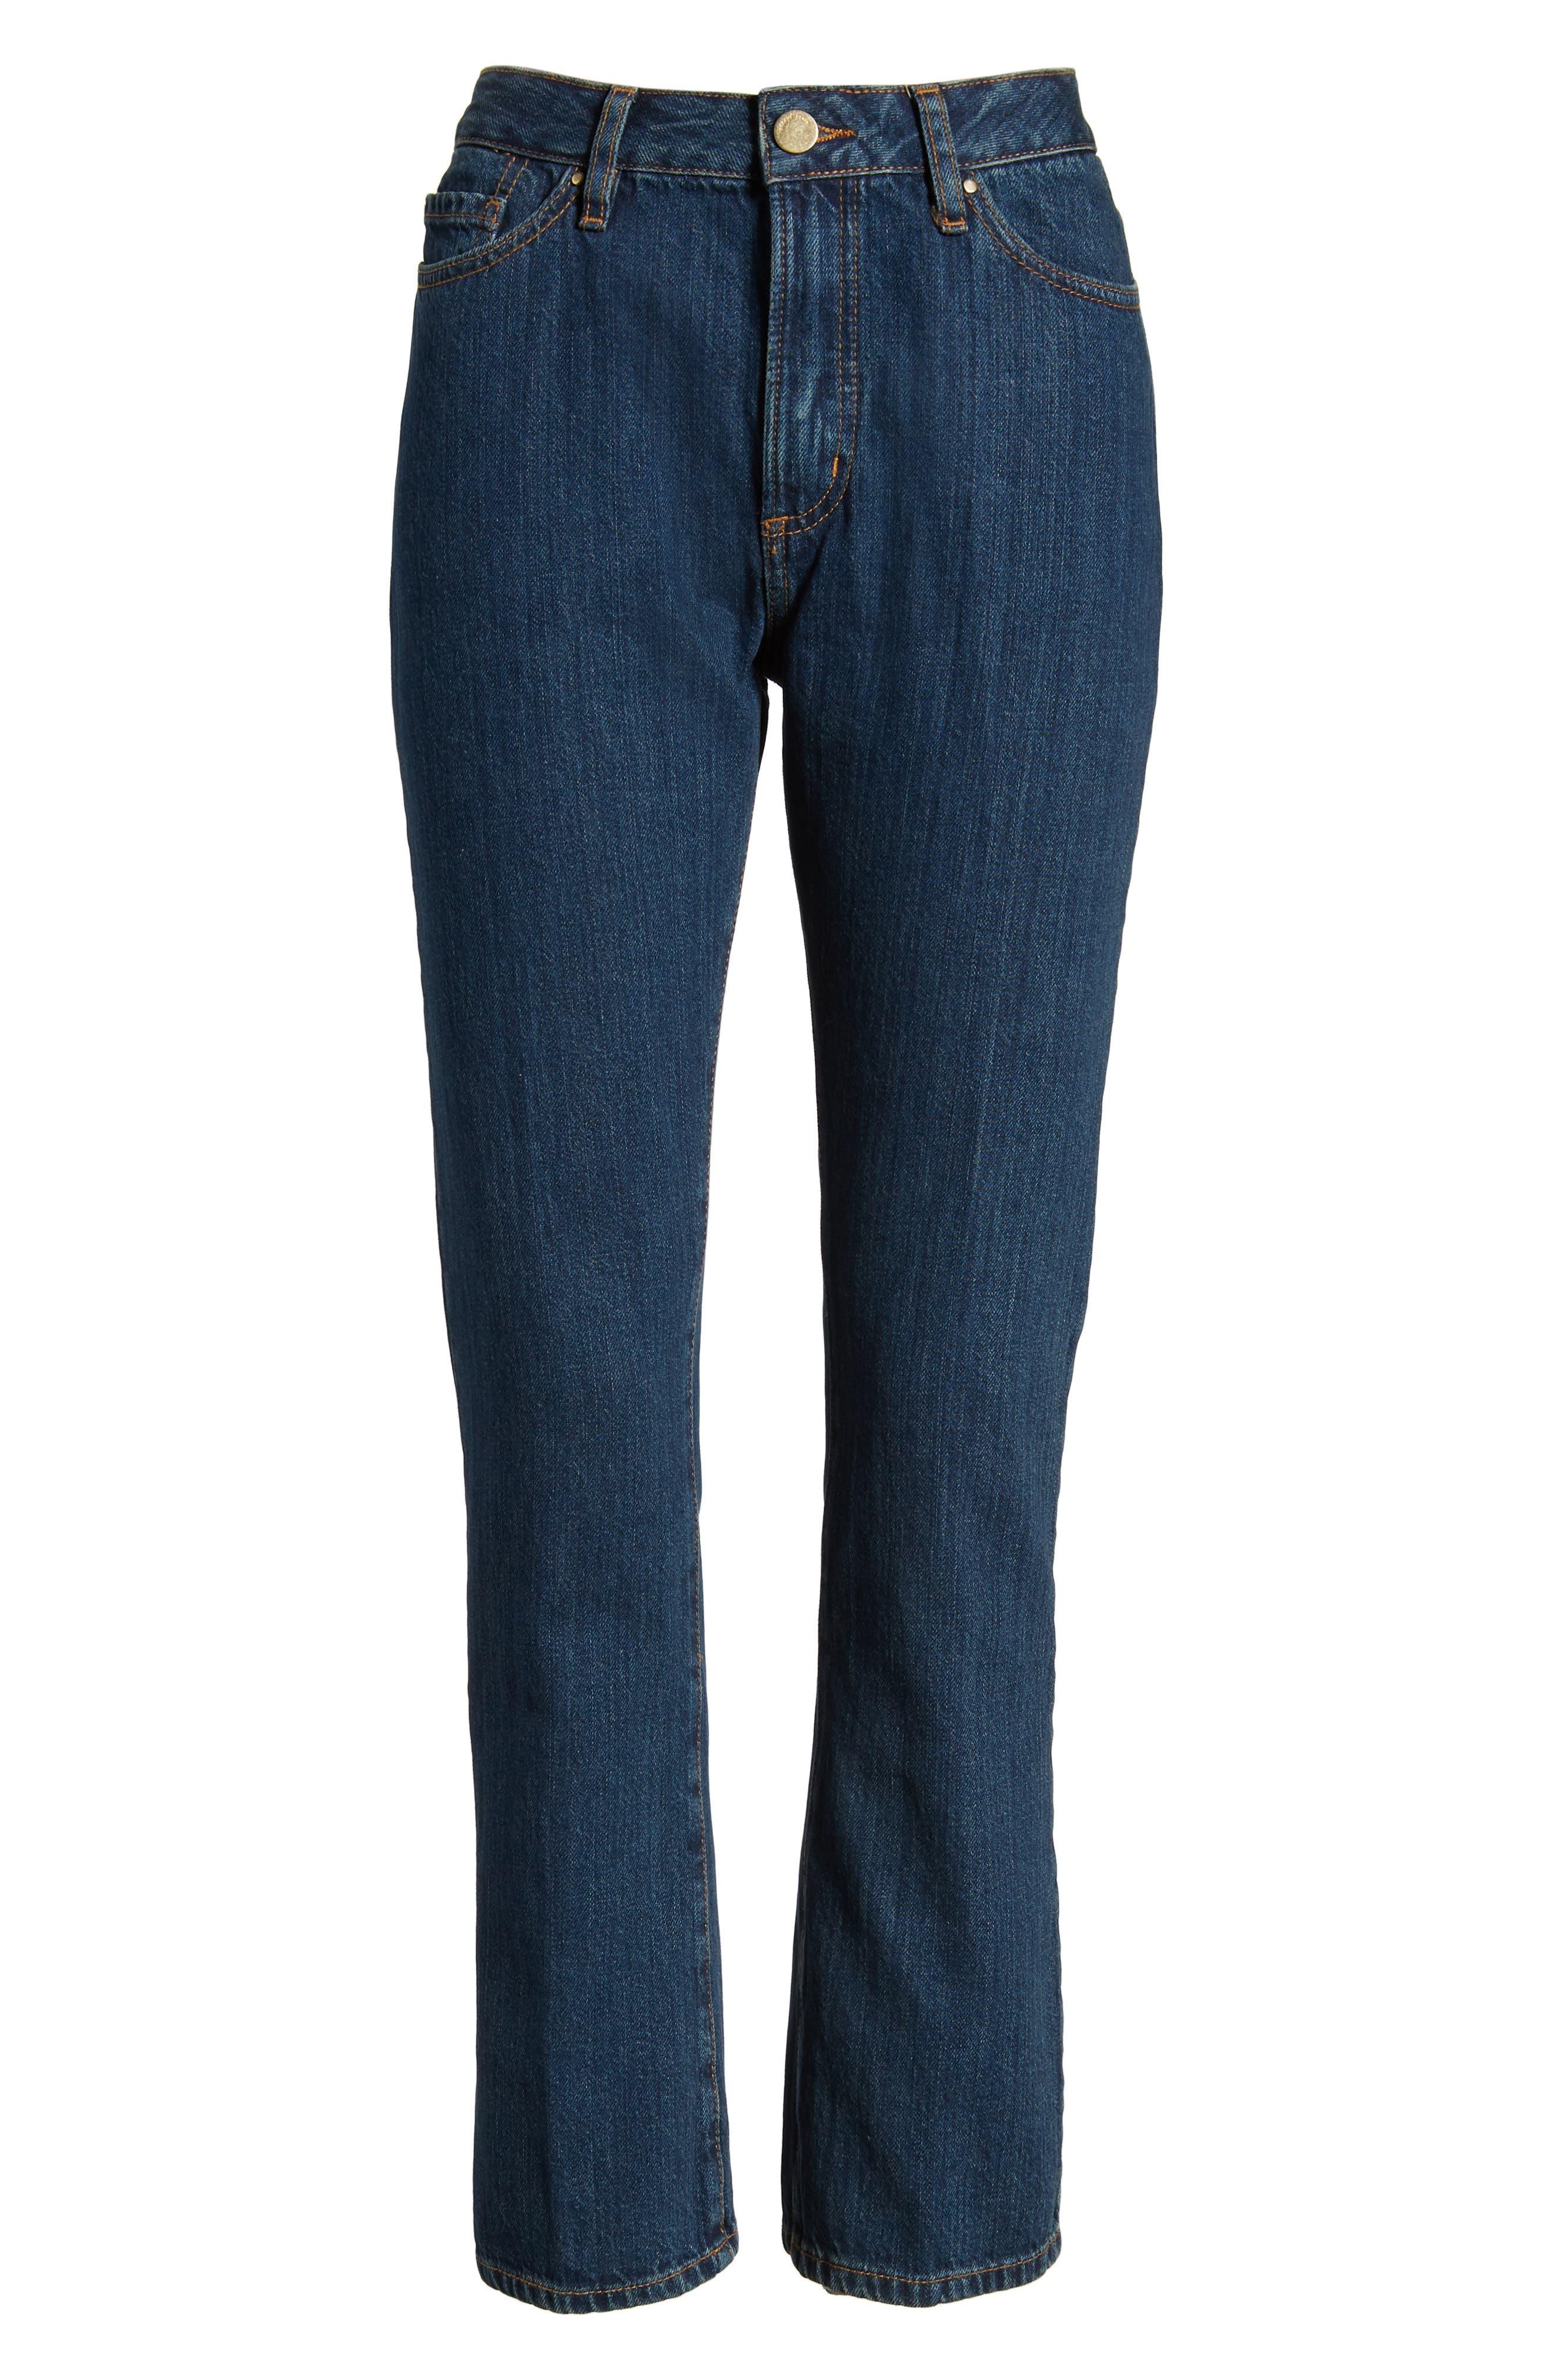 1970 The Flared Crop Jeans,                             Alternate thumbnail 7, color,                             Blue Denim